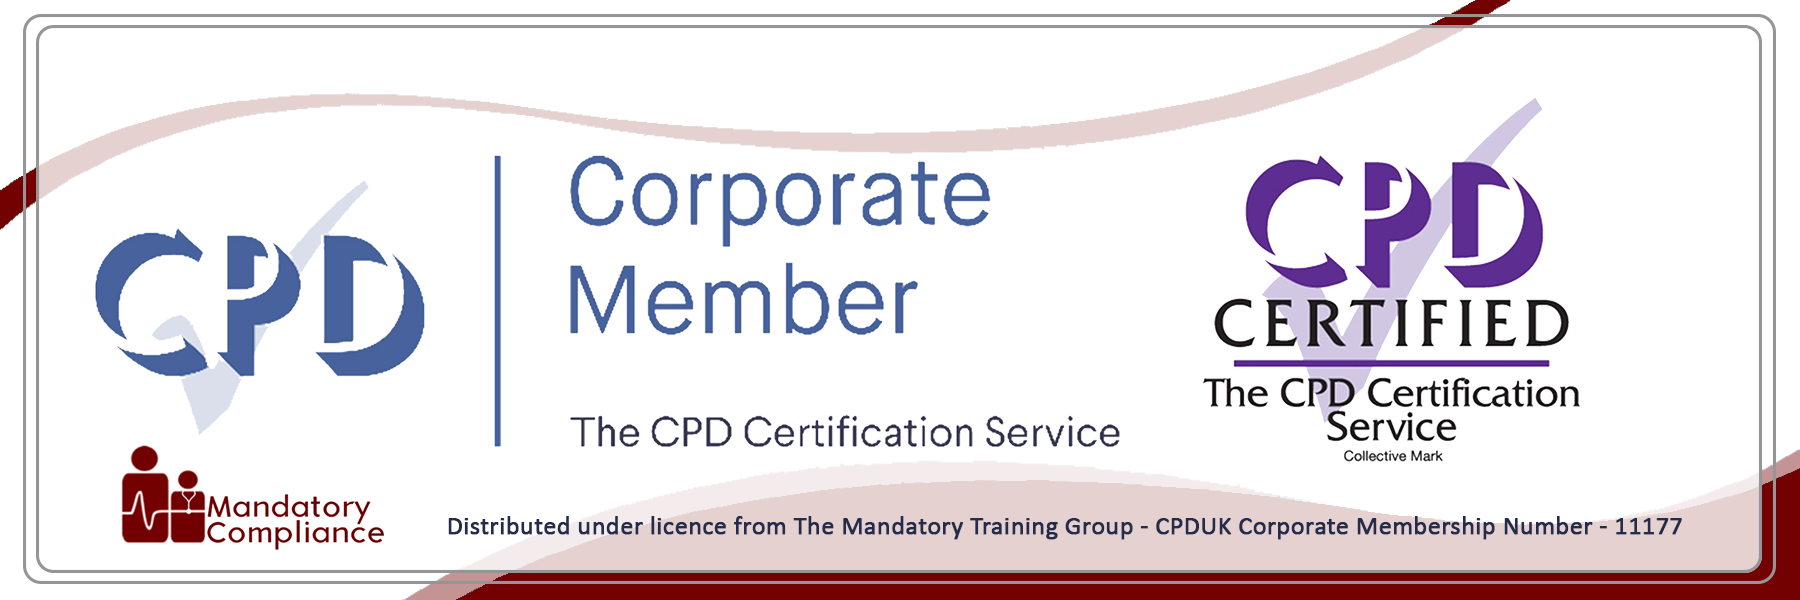 Pressure Area Care - e-Learning Course - CPDUK Certified - Mandatory Compliance UK -